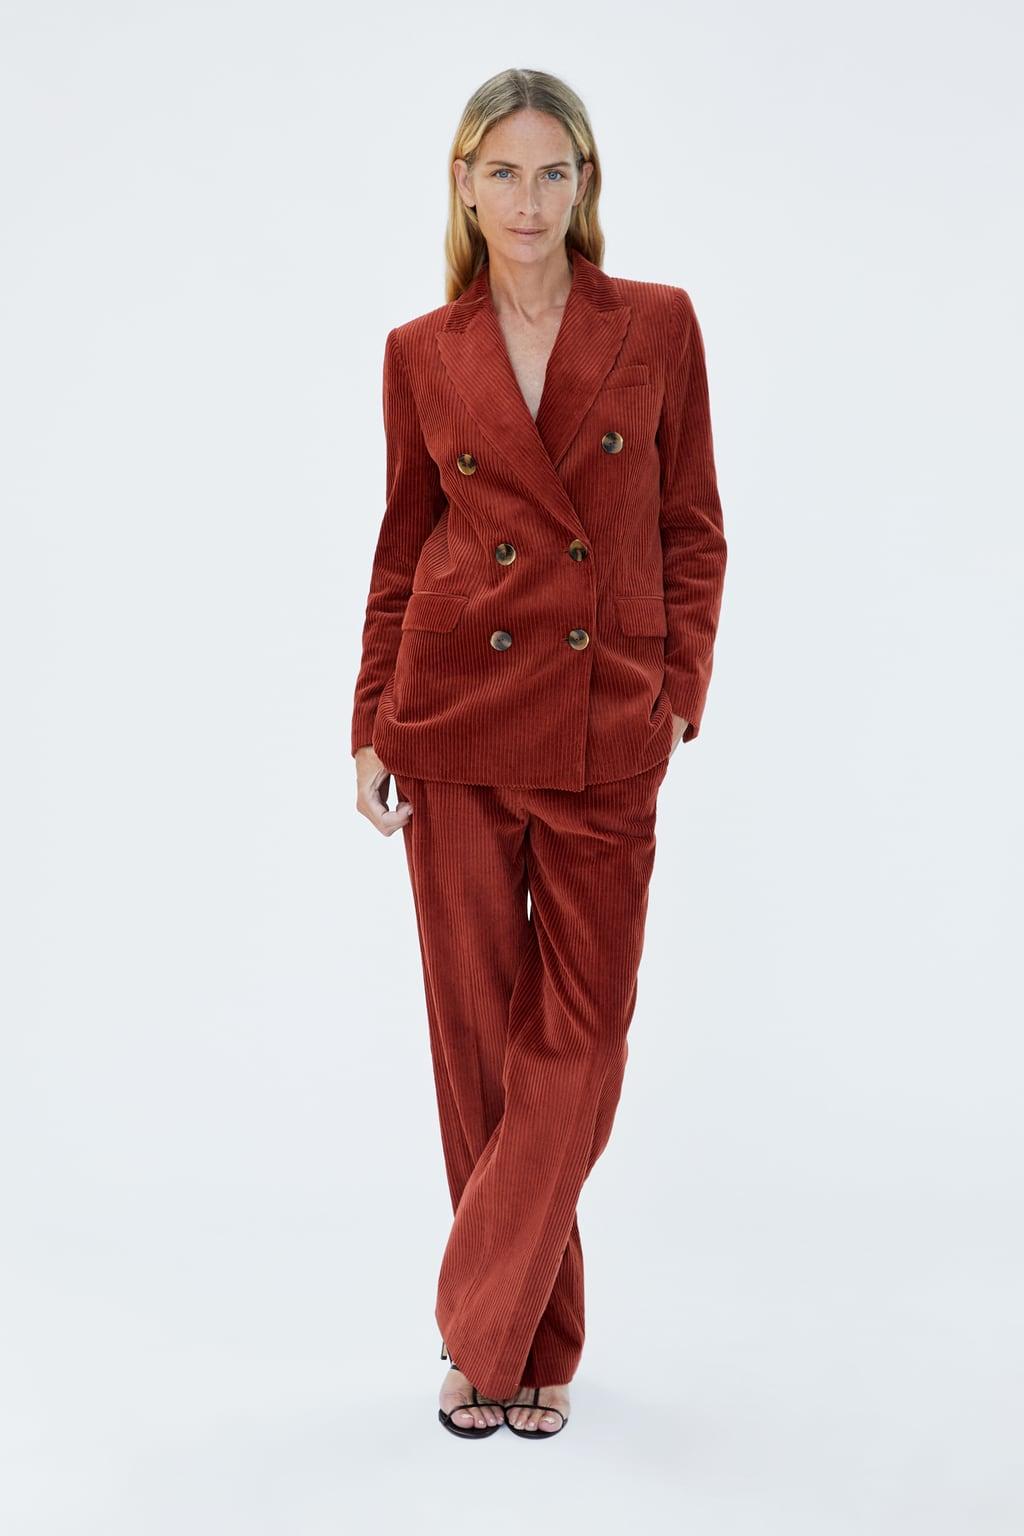 Zara, chaqueta